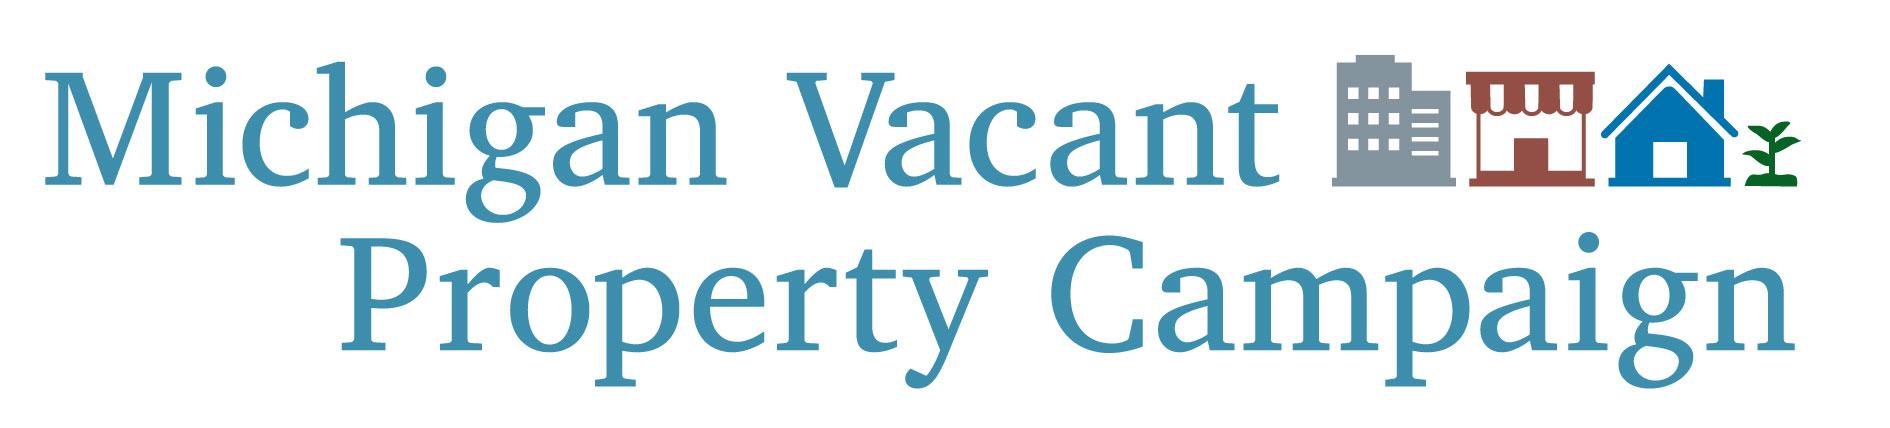 Michigan Vacant Property Campaign Logo